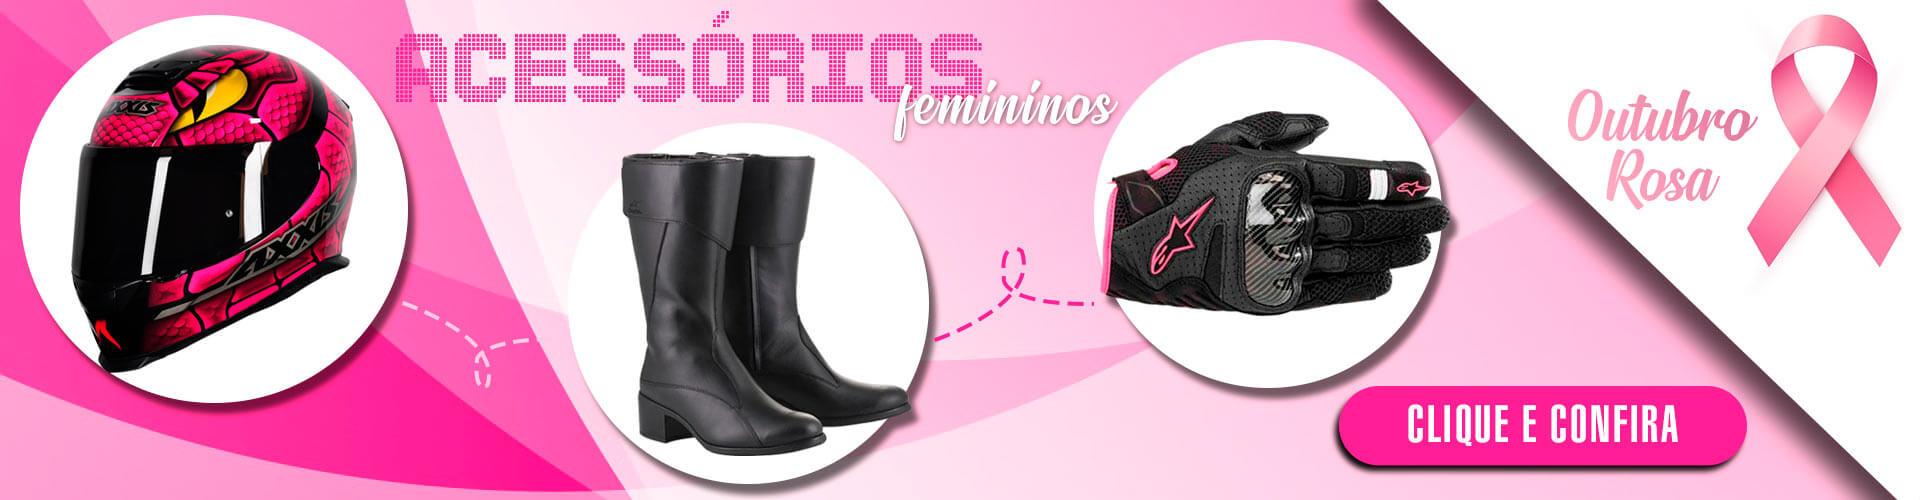 banner principal02 - Feminino